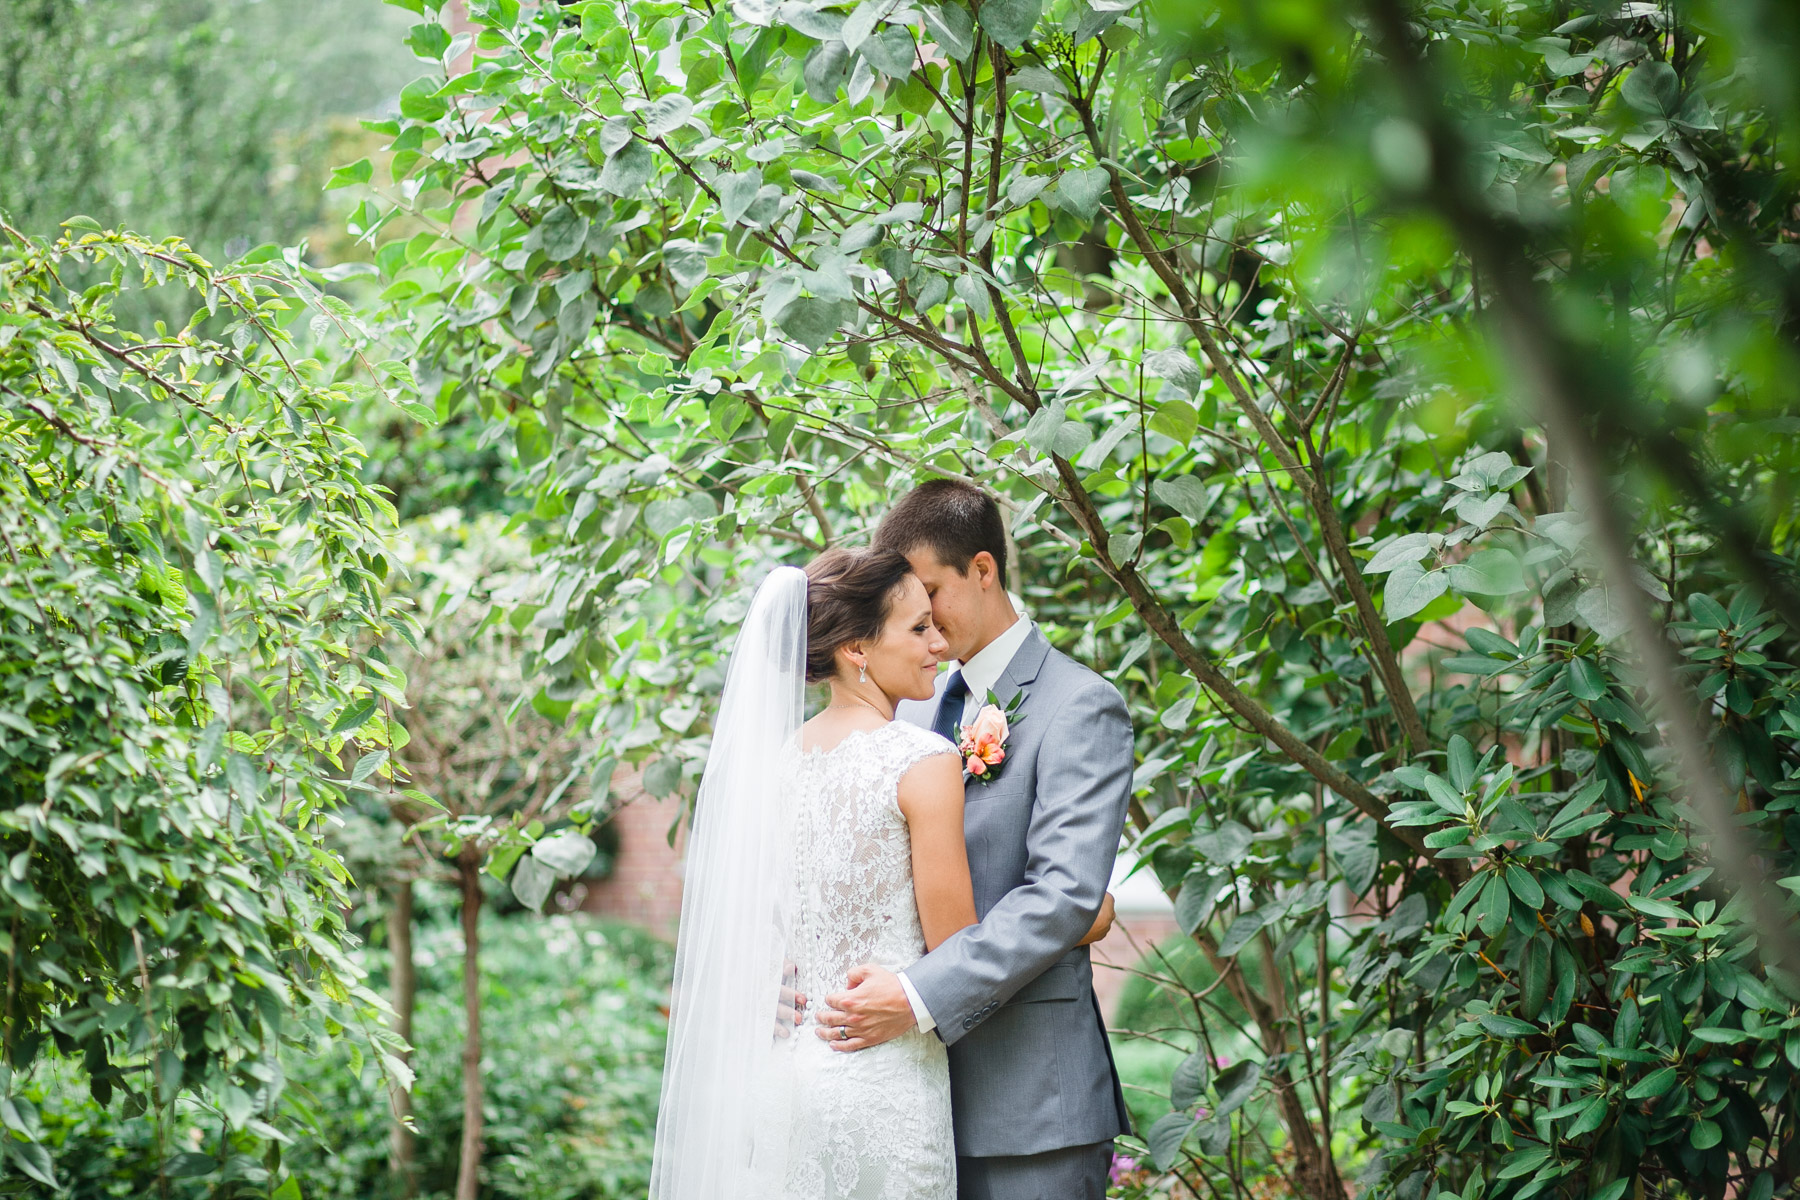 wildwood-park-wedding-photos-56.jpg